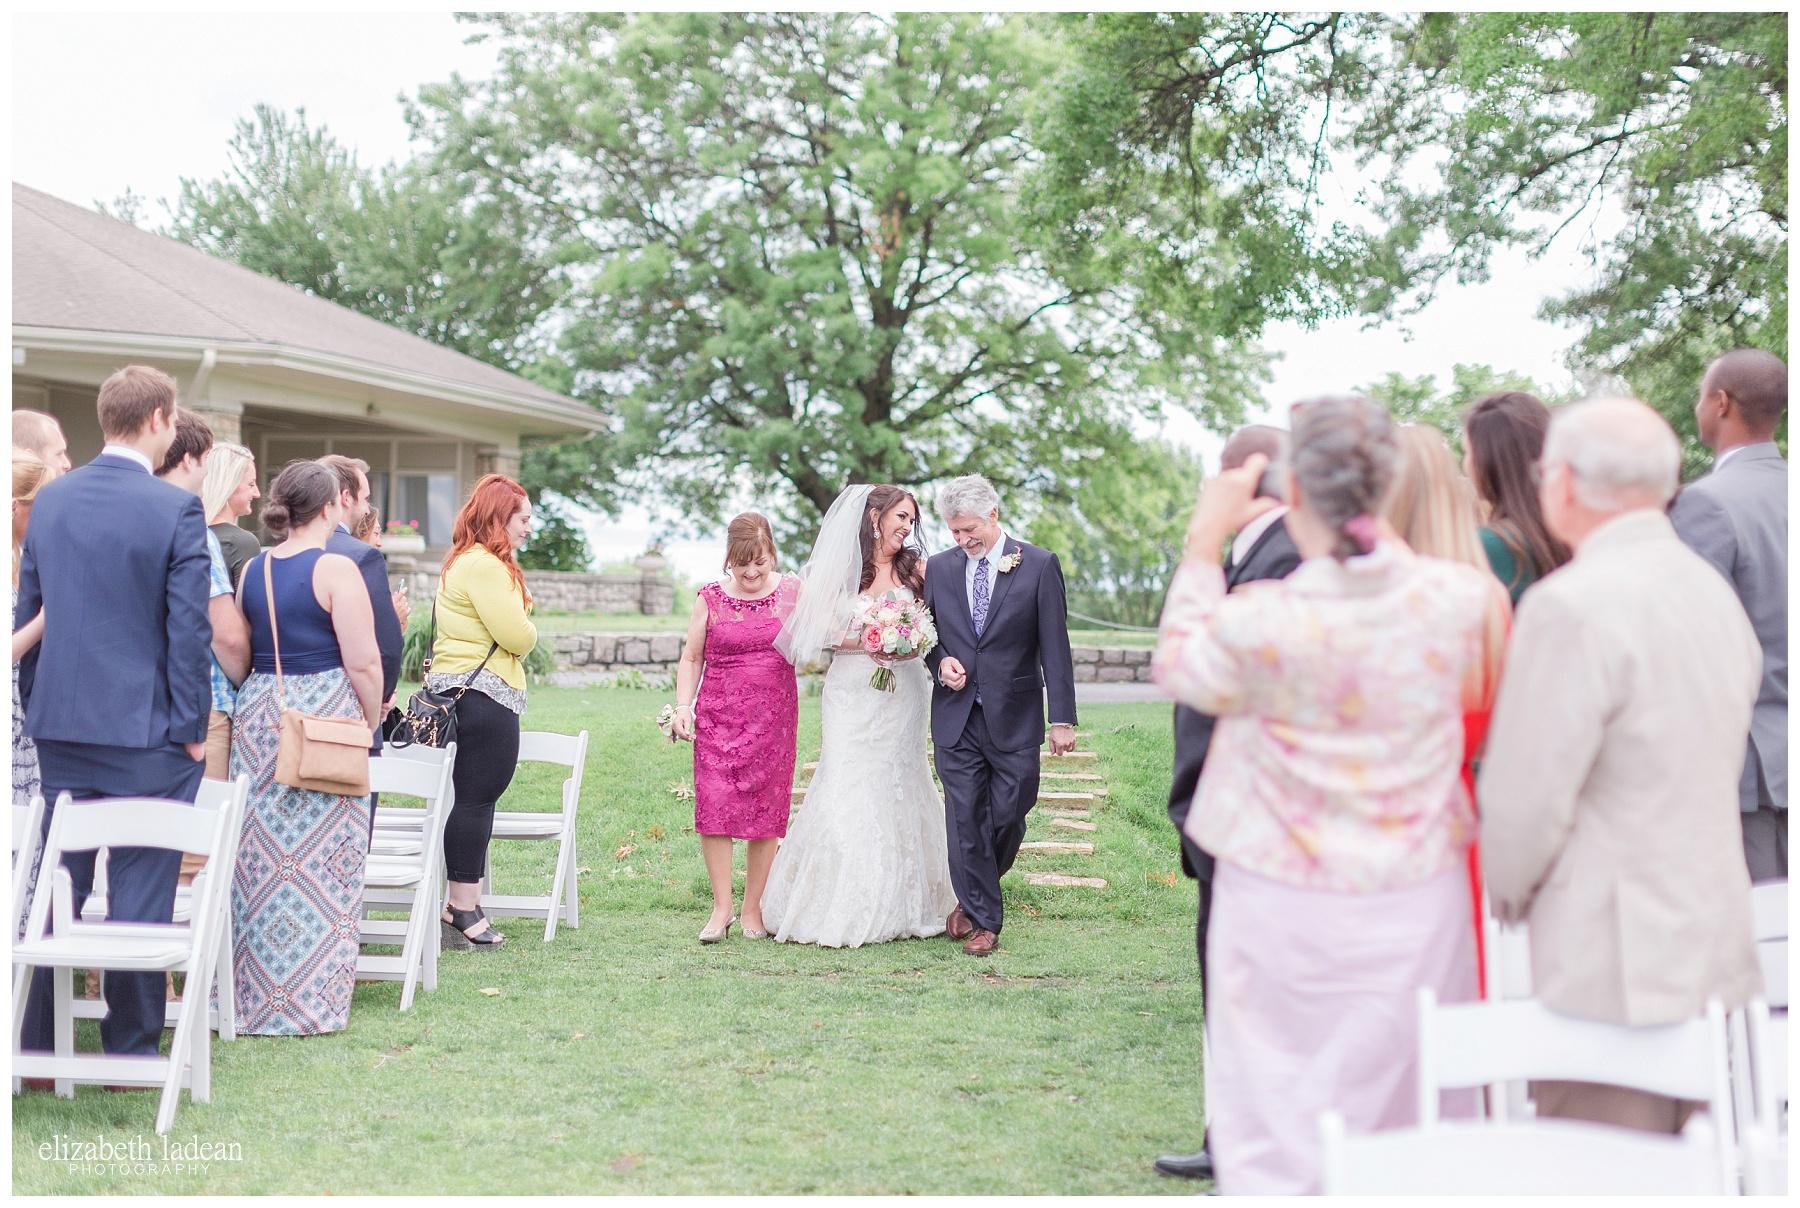 Hillcrest-Country-Club-Kansas-City-Wedding-Photography-E+J-0520-Elizabeth-Ladean-Photography-photo_0835.jpg